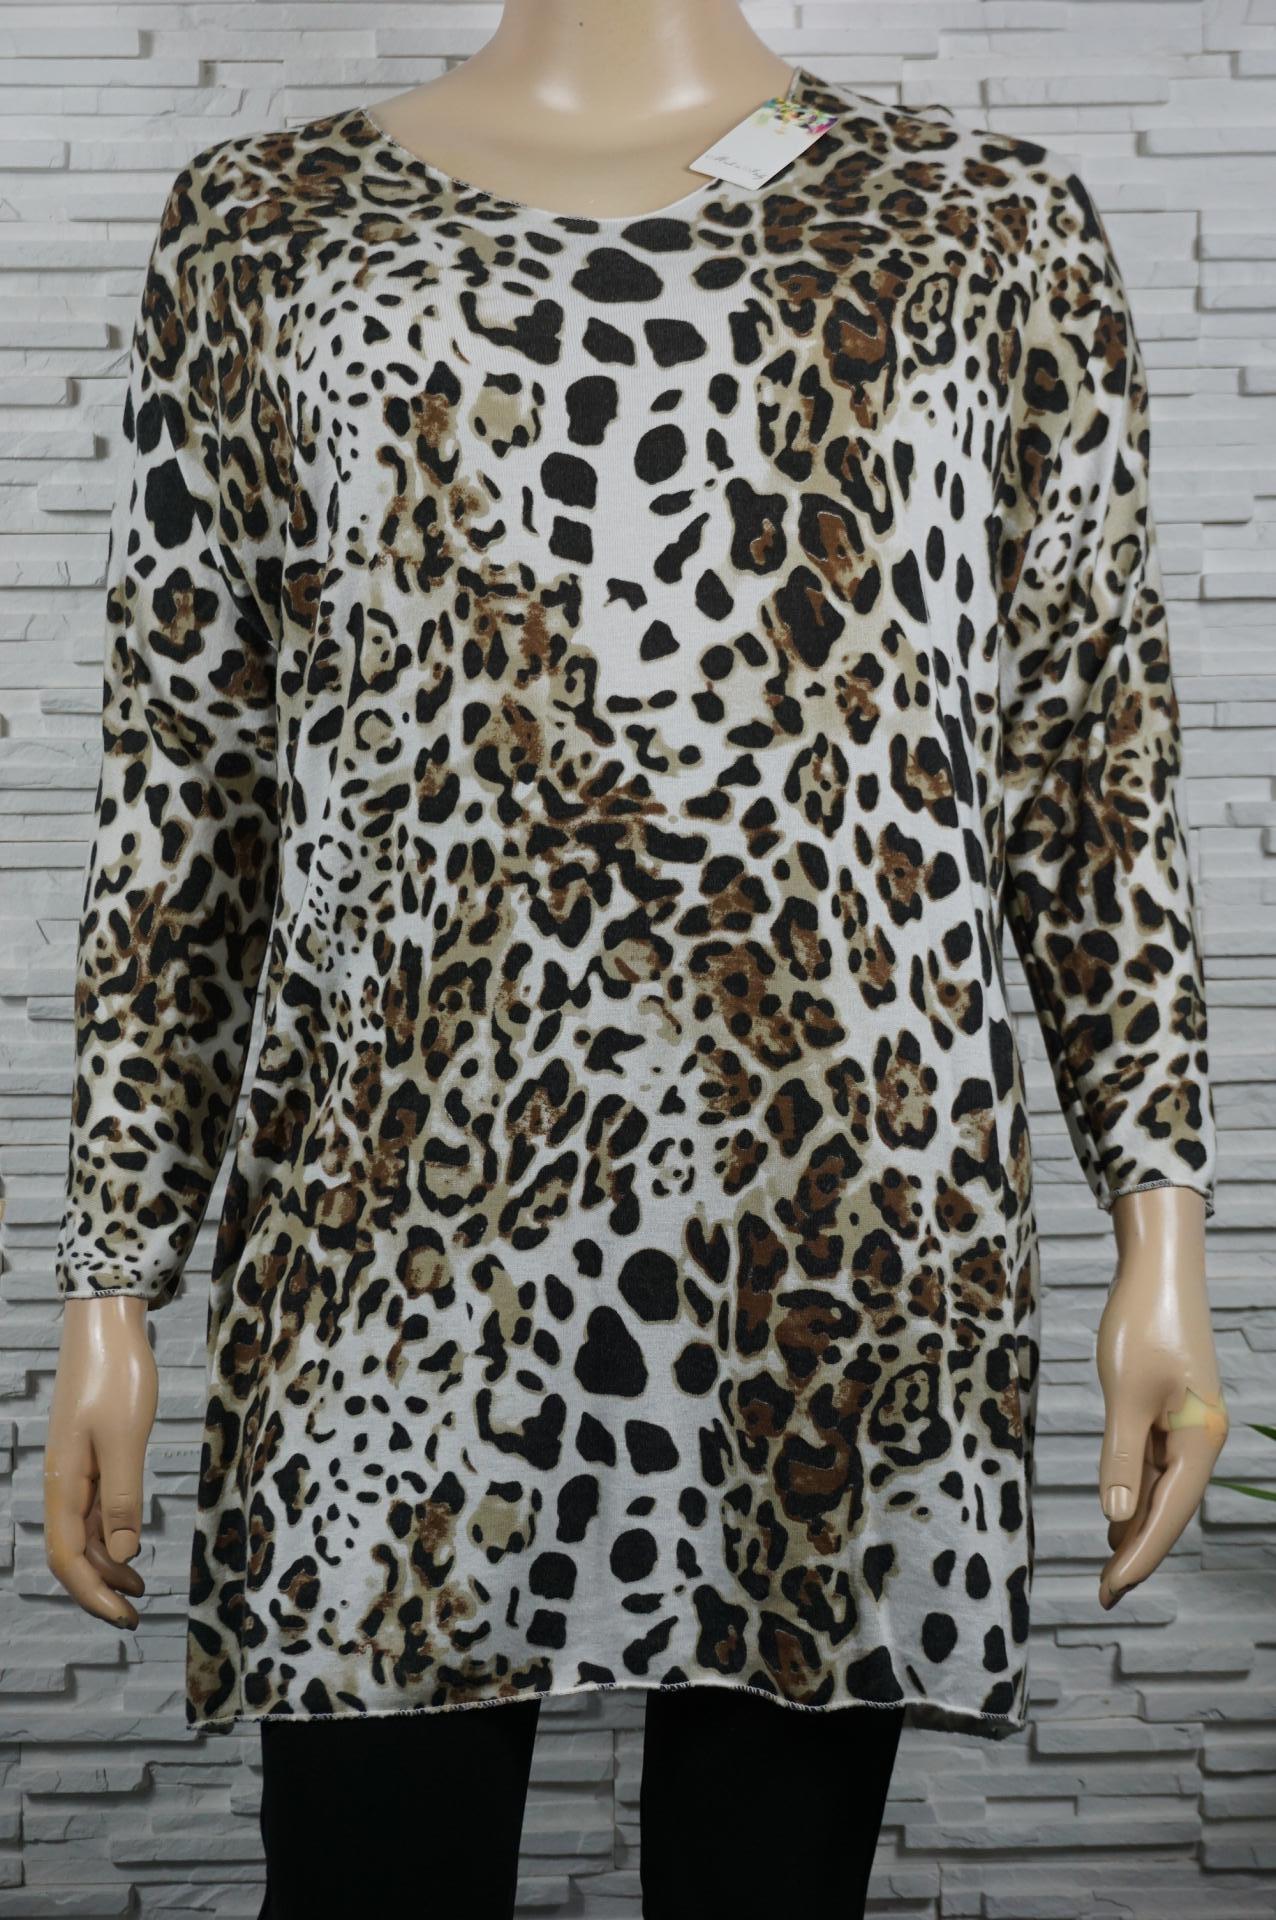 Robe ou pull léger long en léopard.